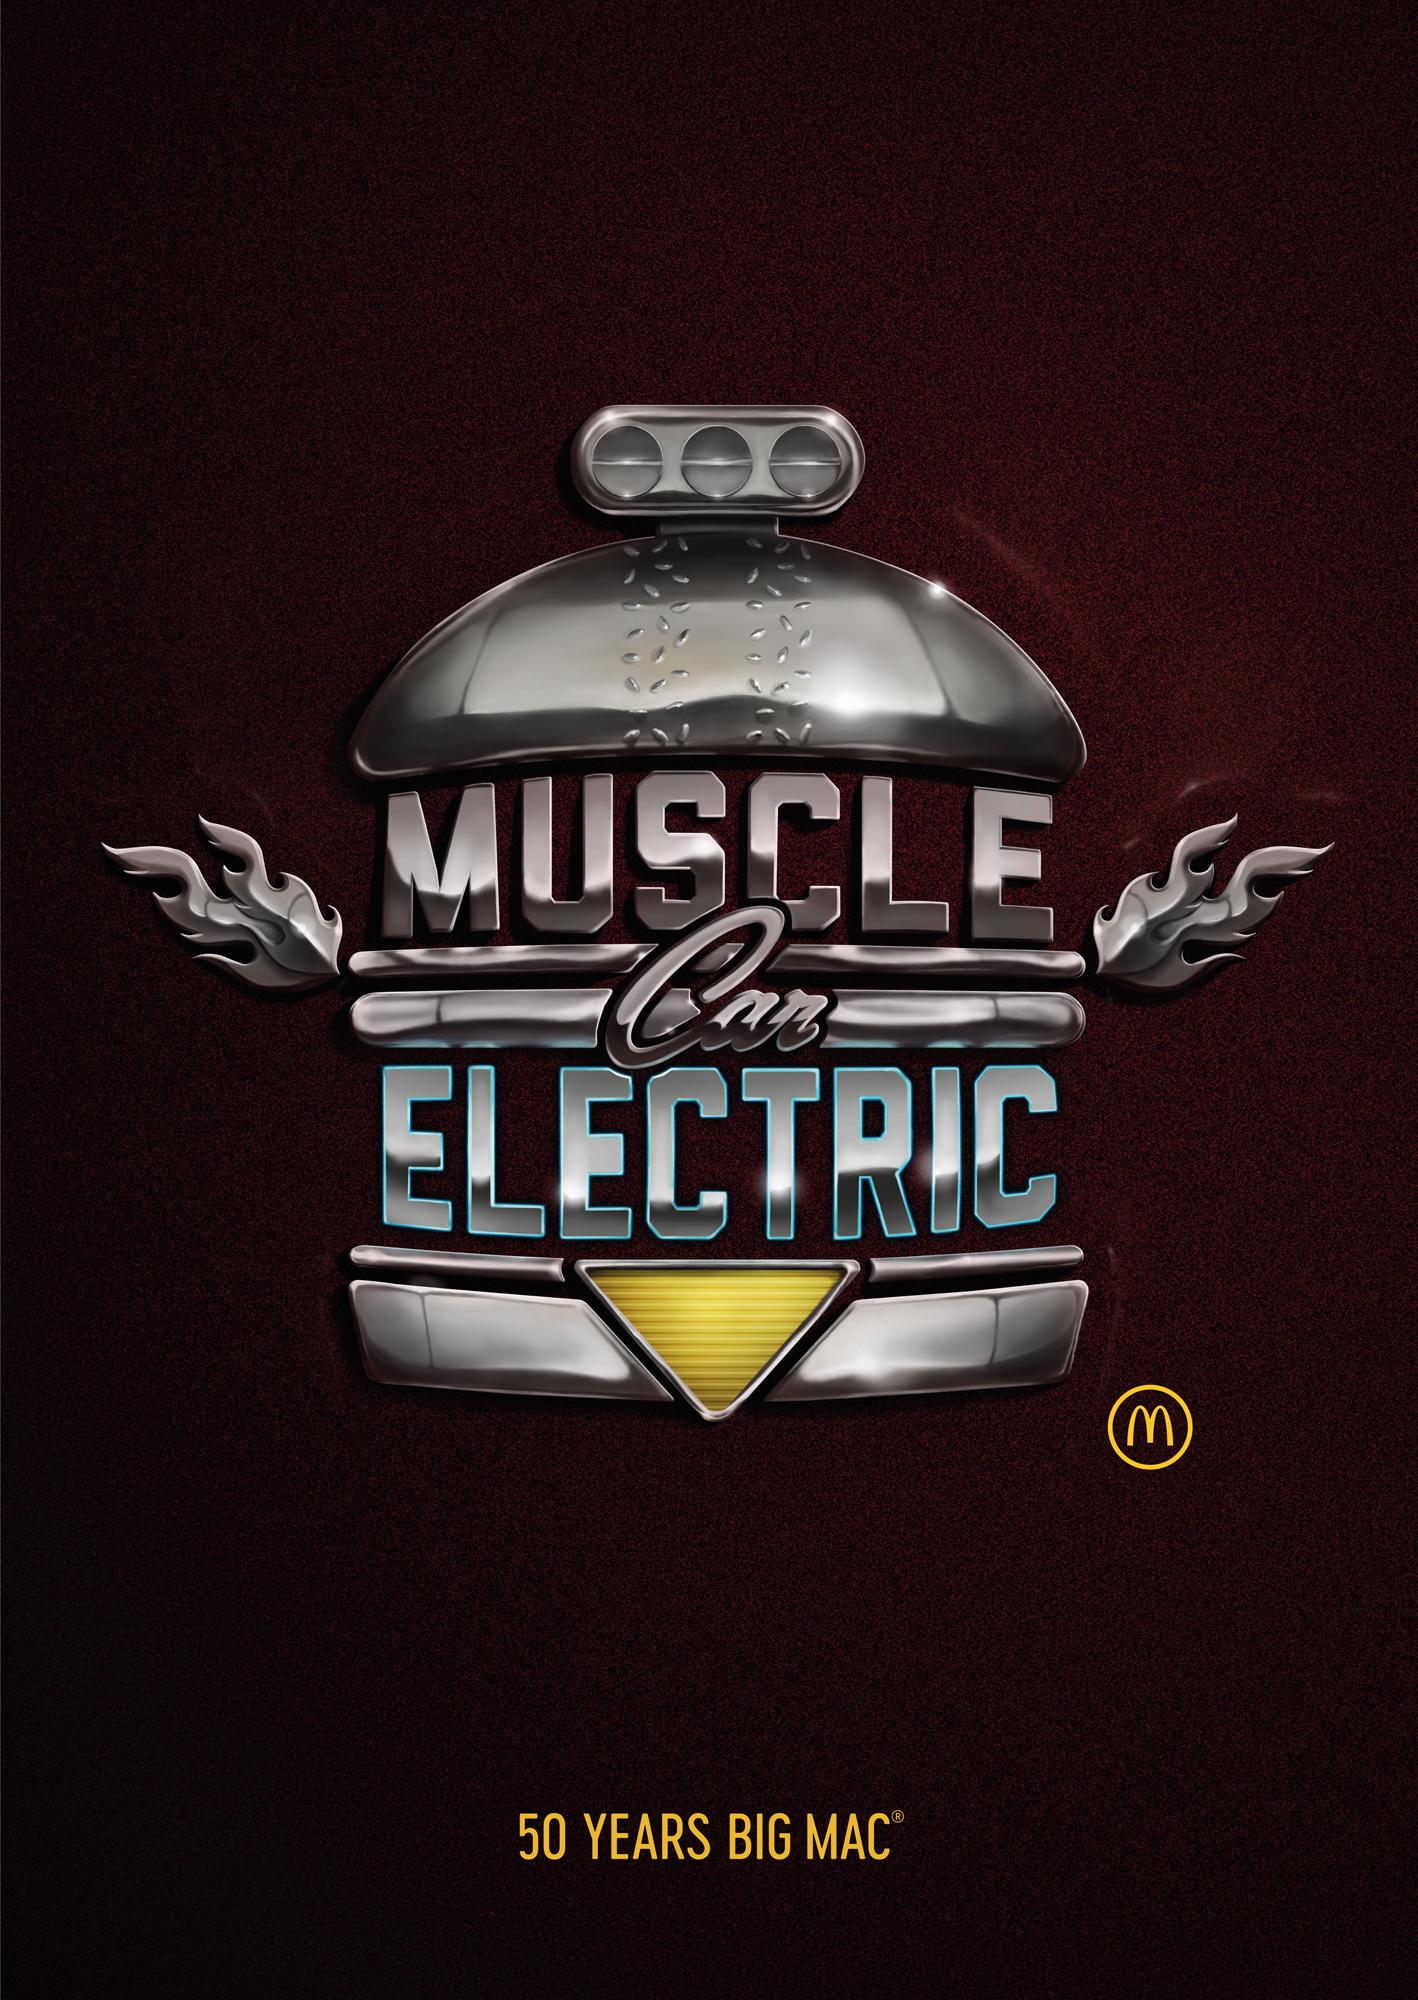 36_Muscle_Electric.jpg